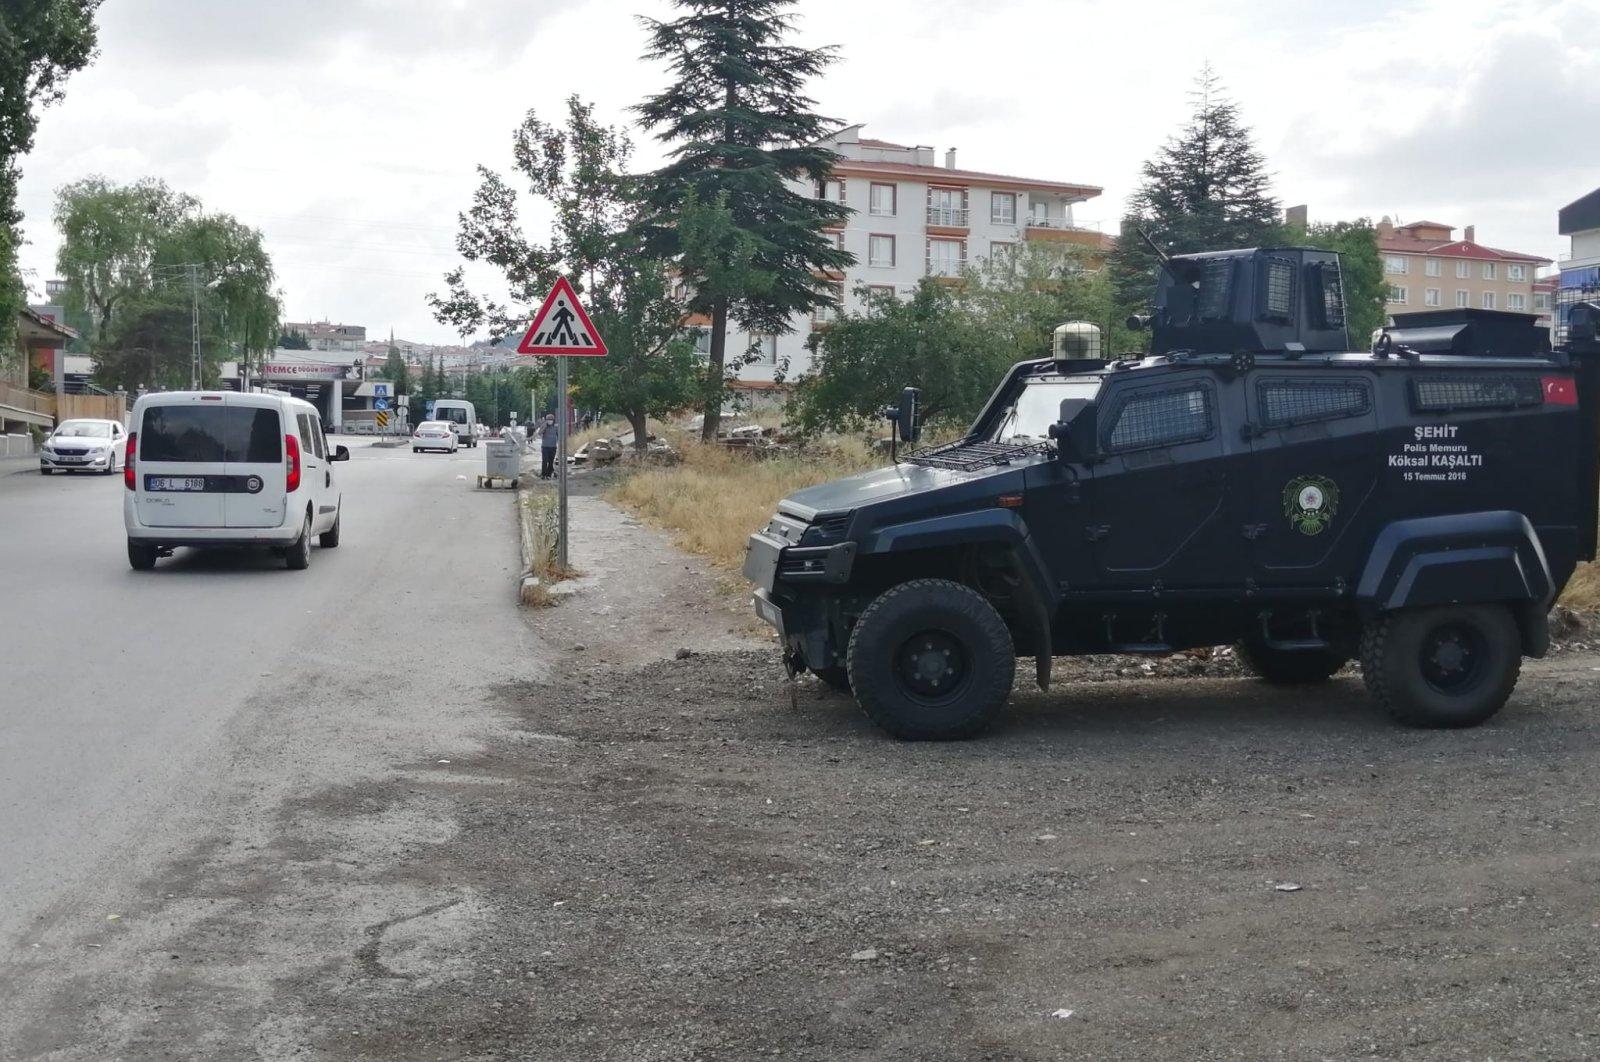 Security forces are seen in Altındağ district, Ankara, Turkey, Aug. 11, 2021. (IHA Photo)